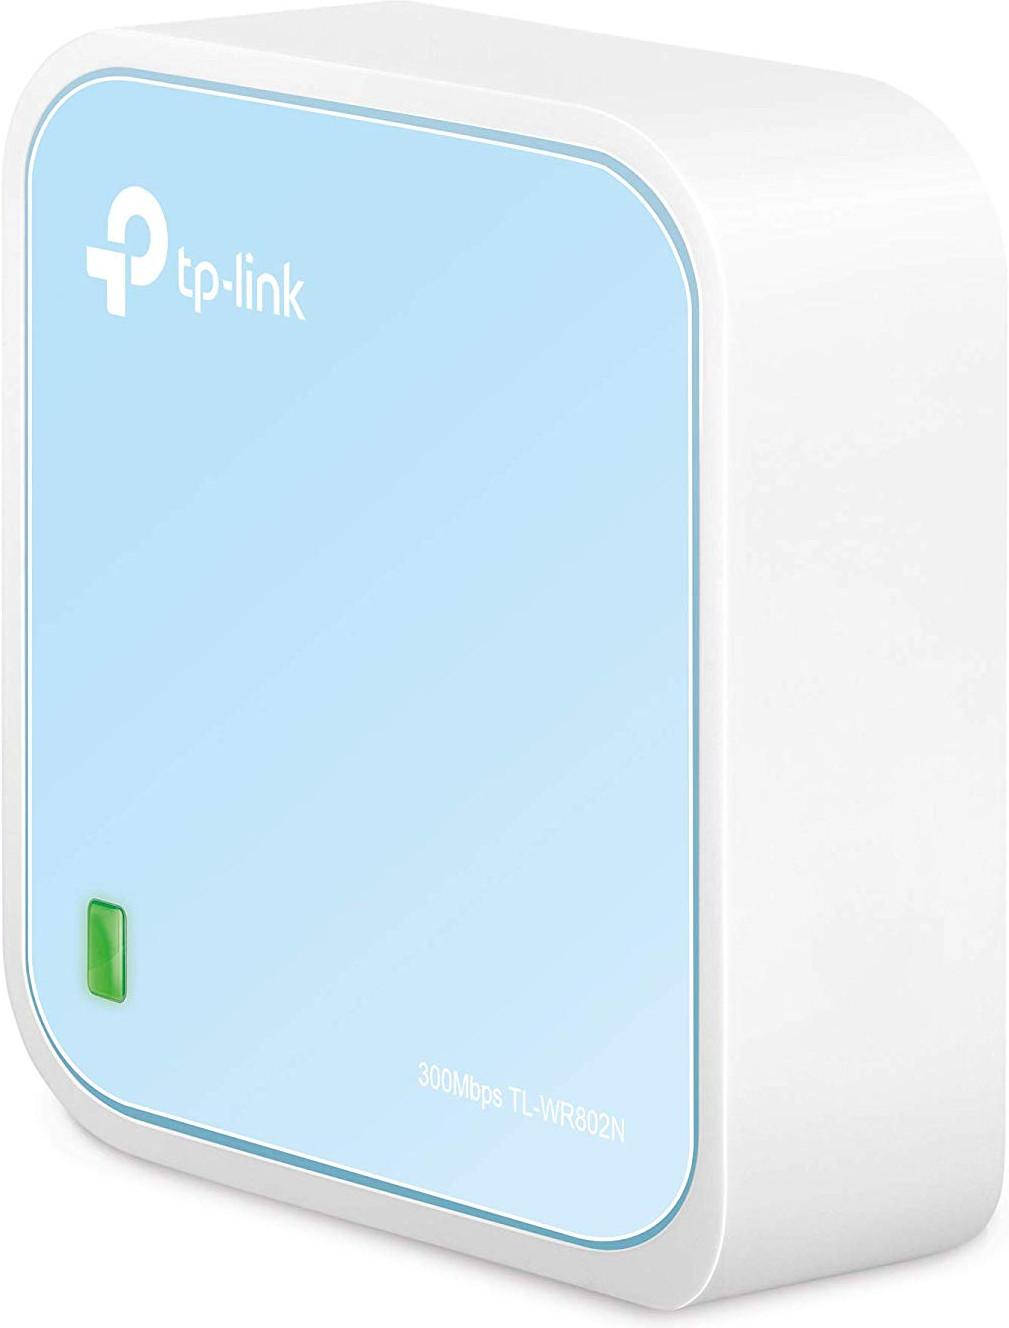 Tp-link router TL-WR802N